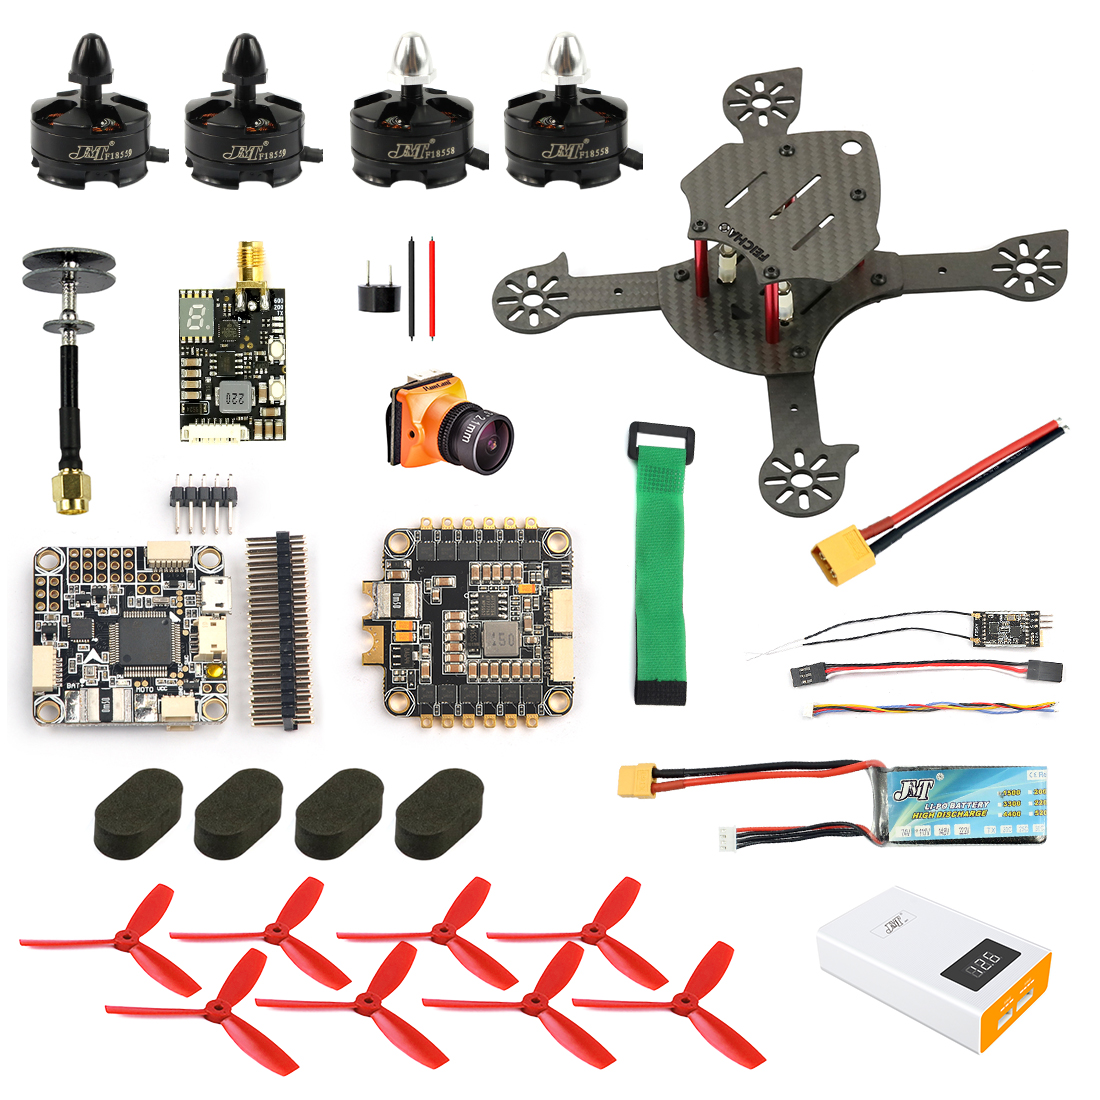 JMT DIY FPV Racer Drone Quadcopter F4 Pro V2 Flight Control